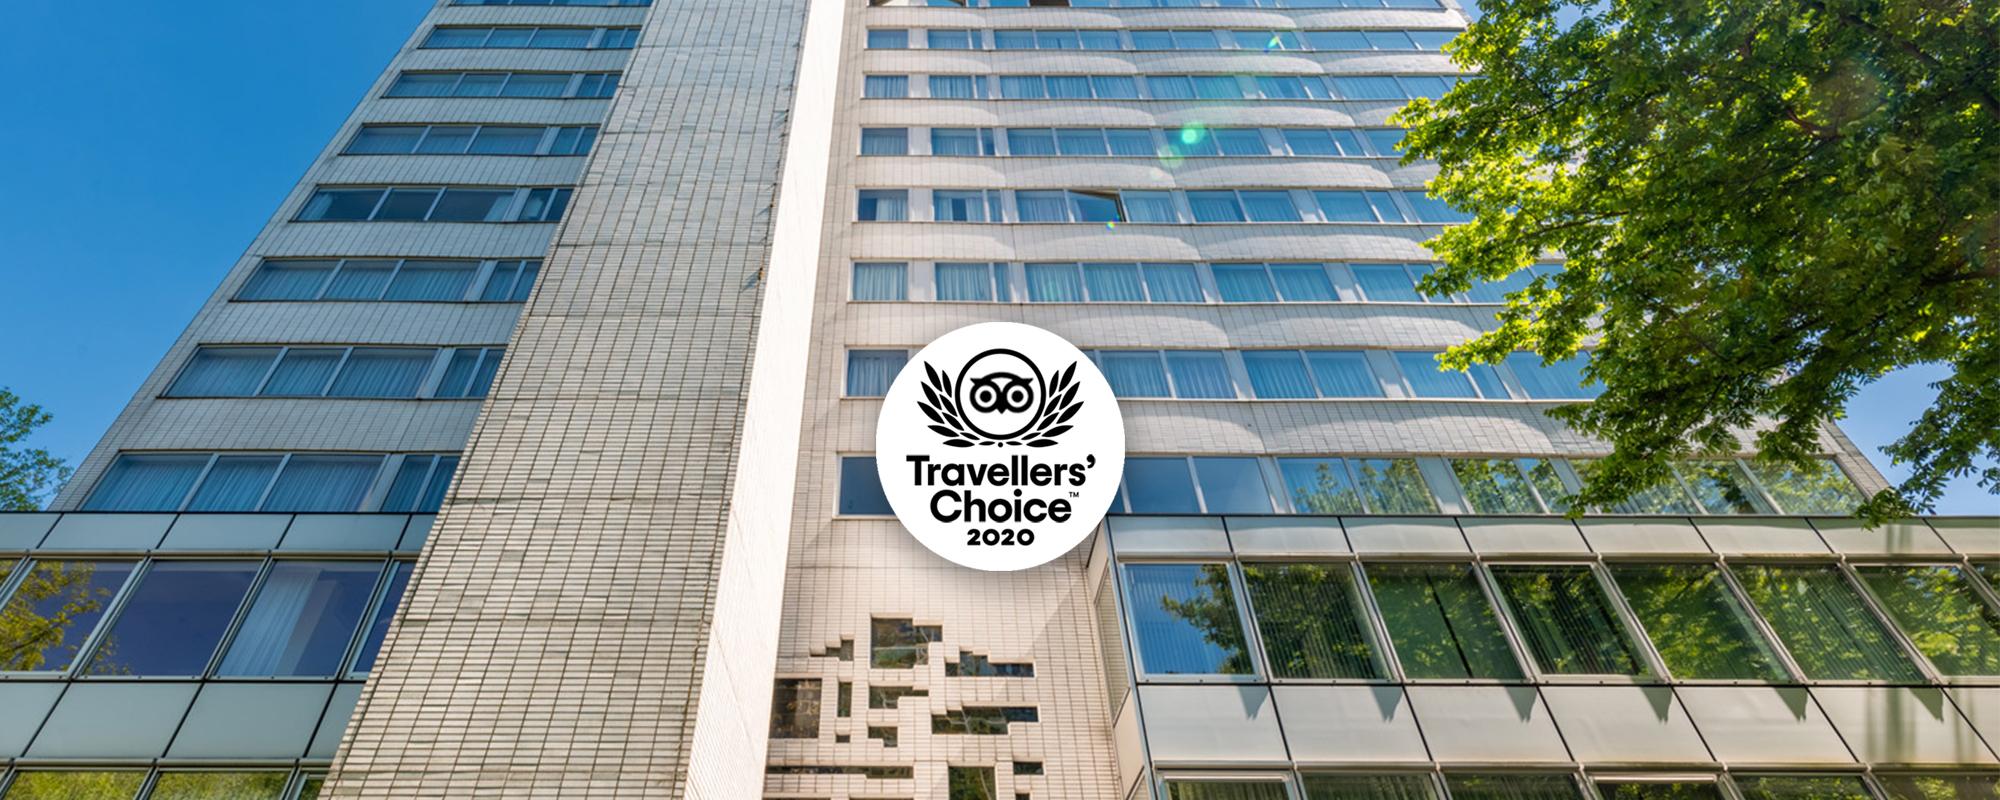 Htel wins 2020 Tripadvisor Travellers' Choice Award